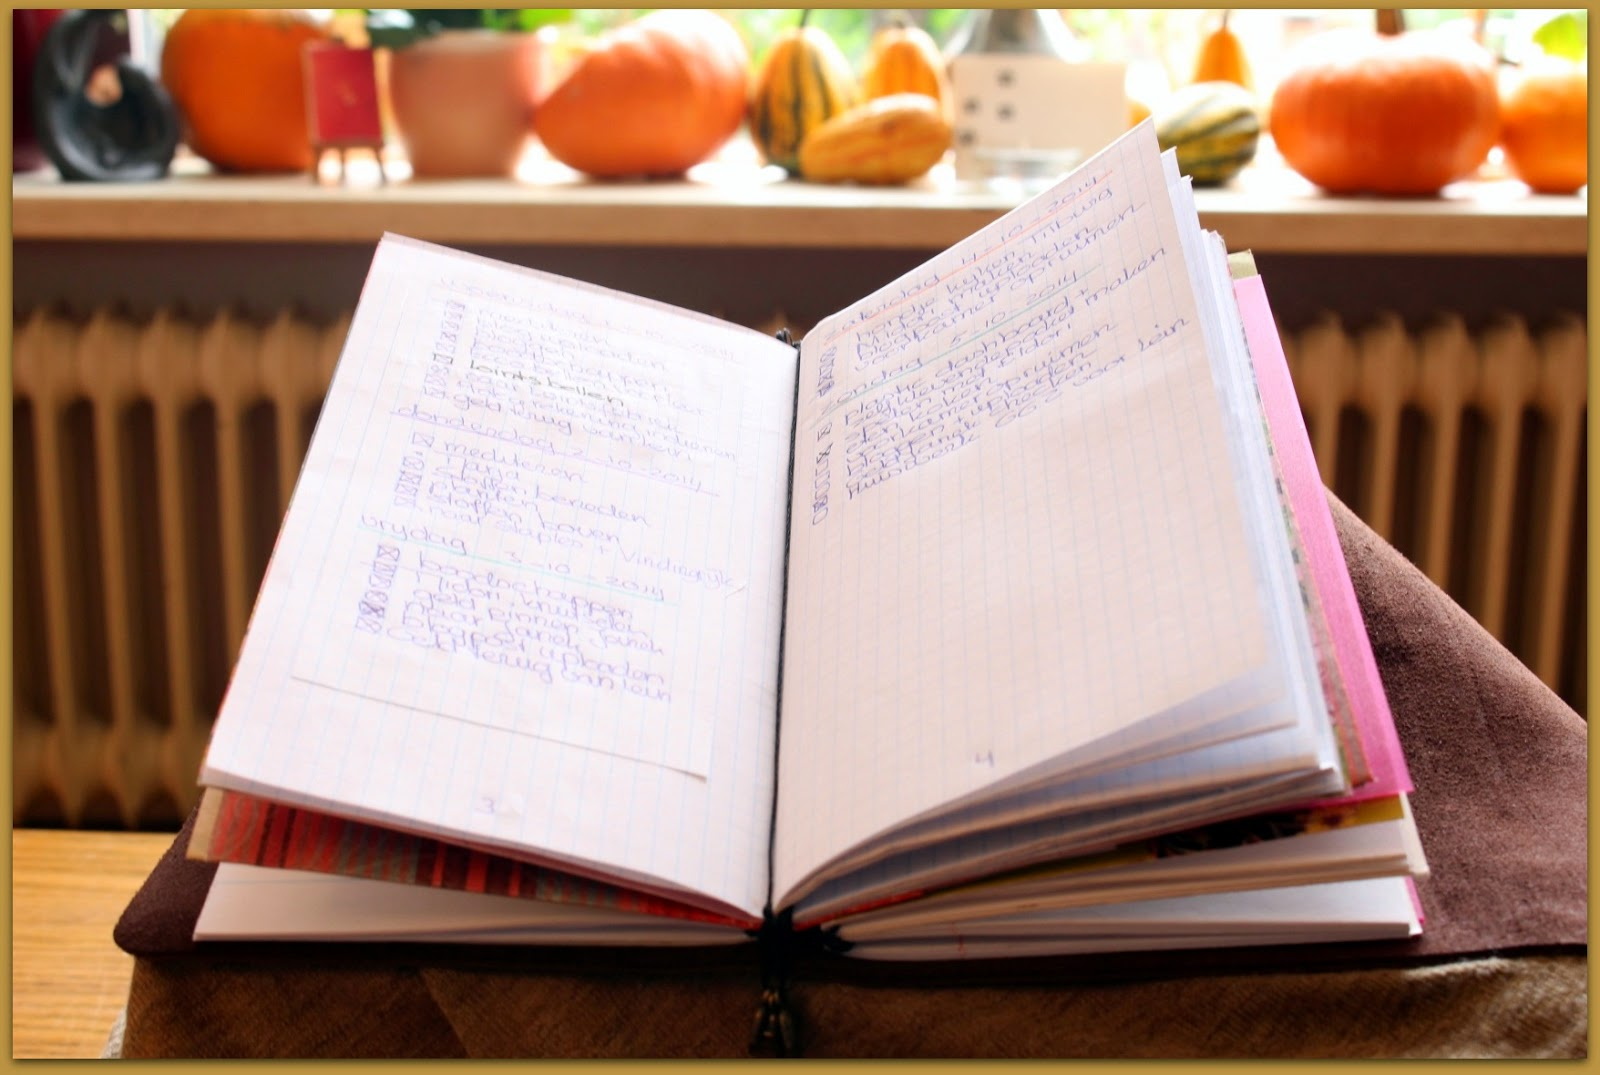 Midori fauxdori Travelers Notebook regular size open bulletjournal